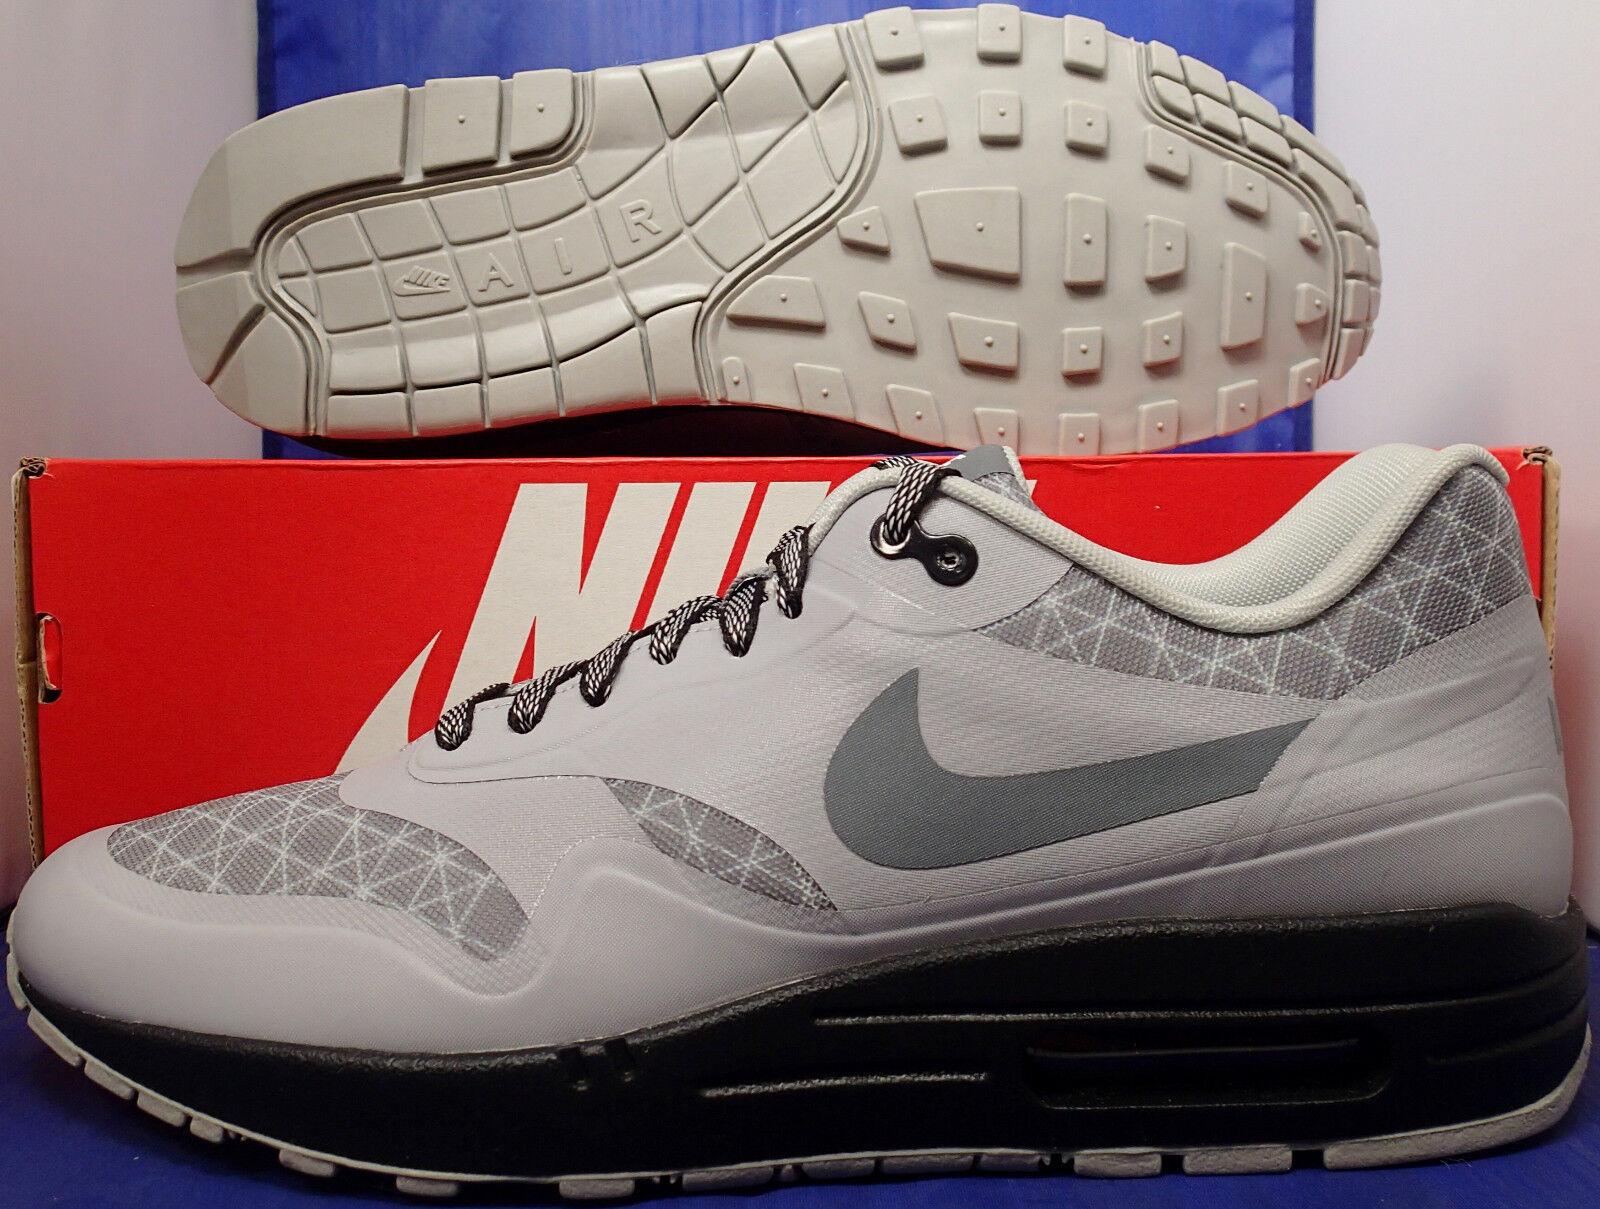 Nike Air Max 1 HTM Tinker Hatfield QS iD Grey Black SZ 9.5 ( 874605-991 )